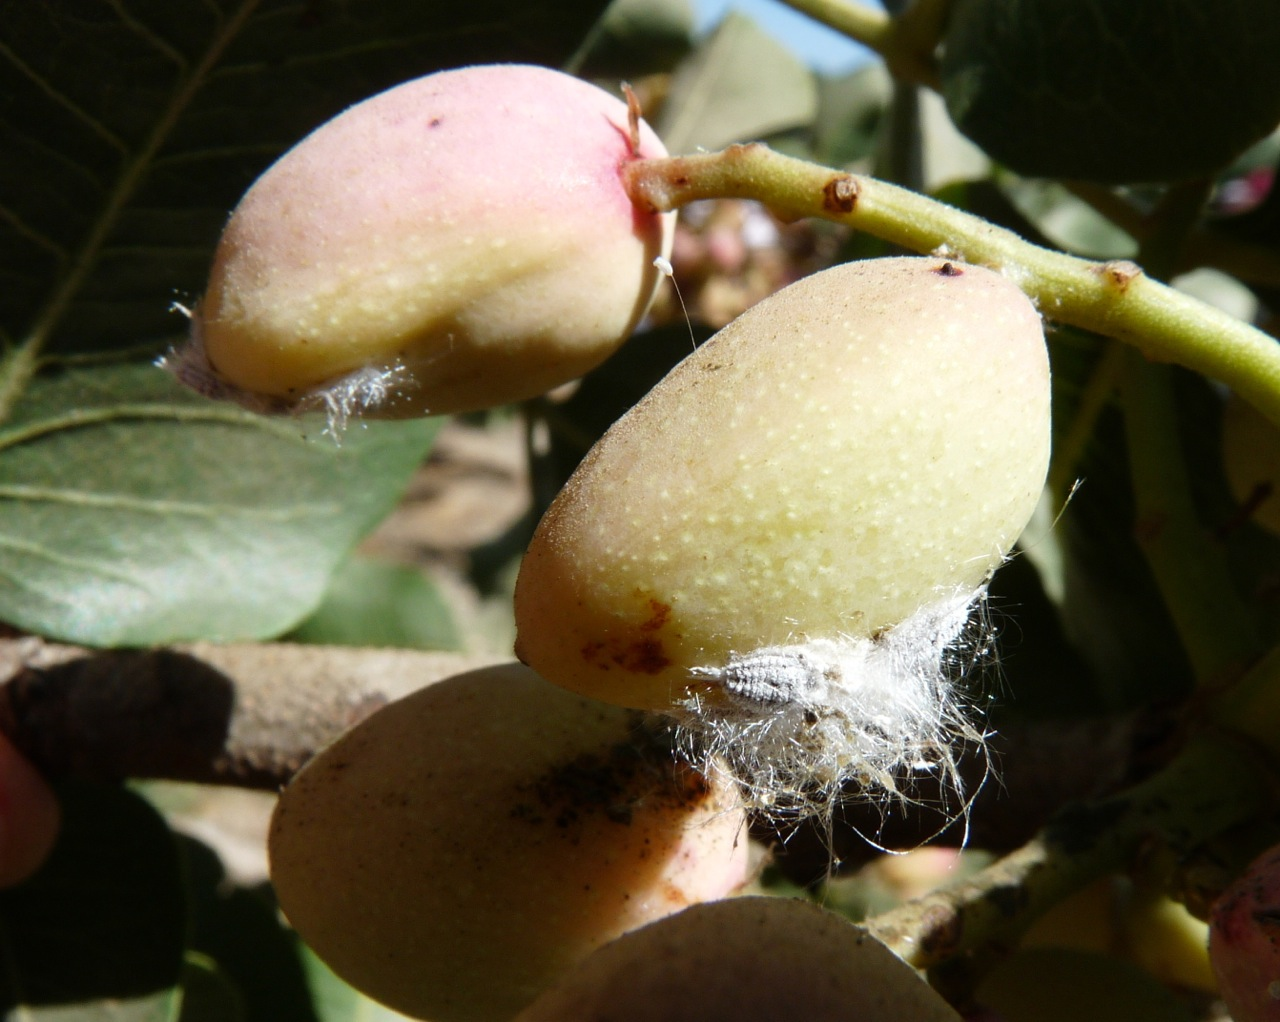 Pistachio Growers: Beware of Gill's Mealybug